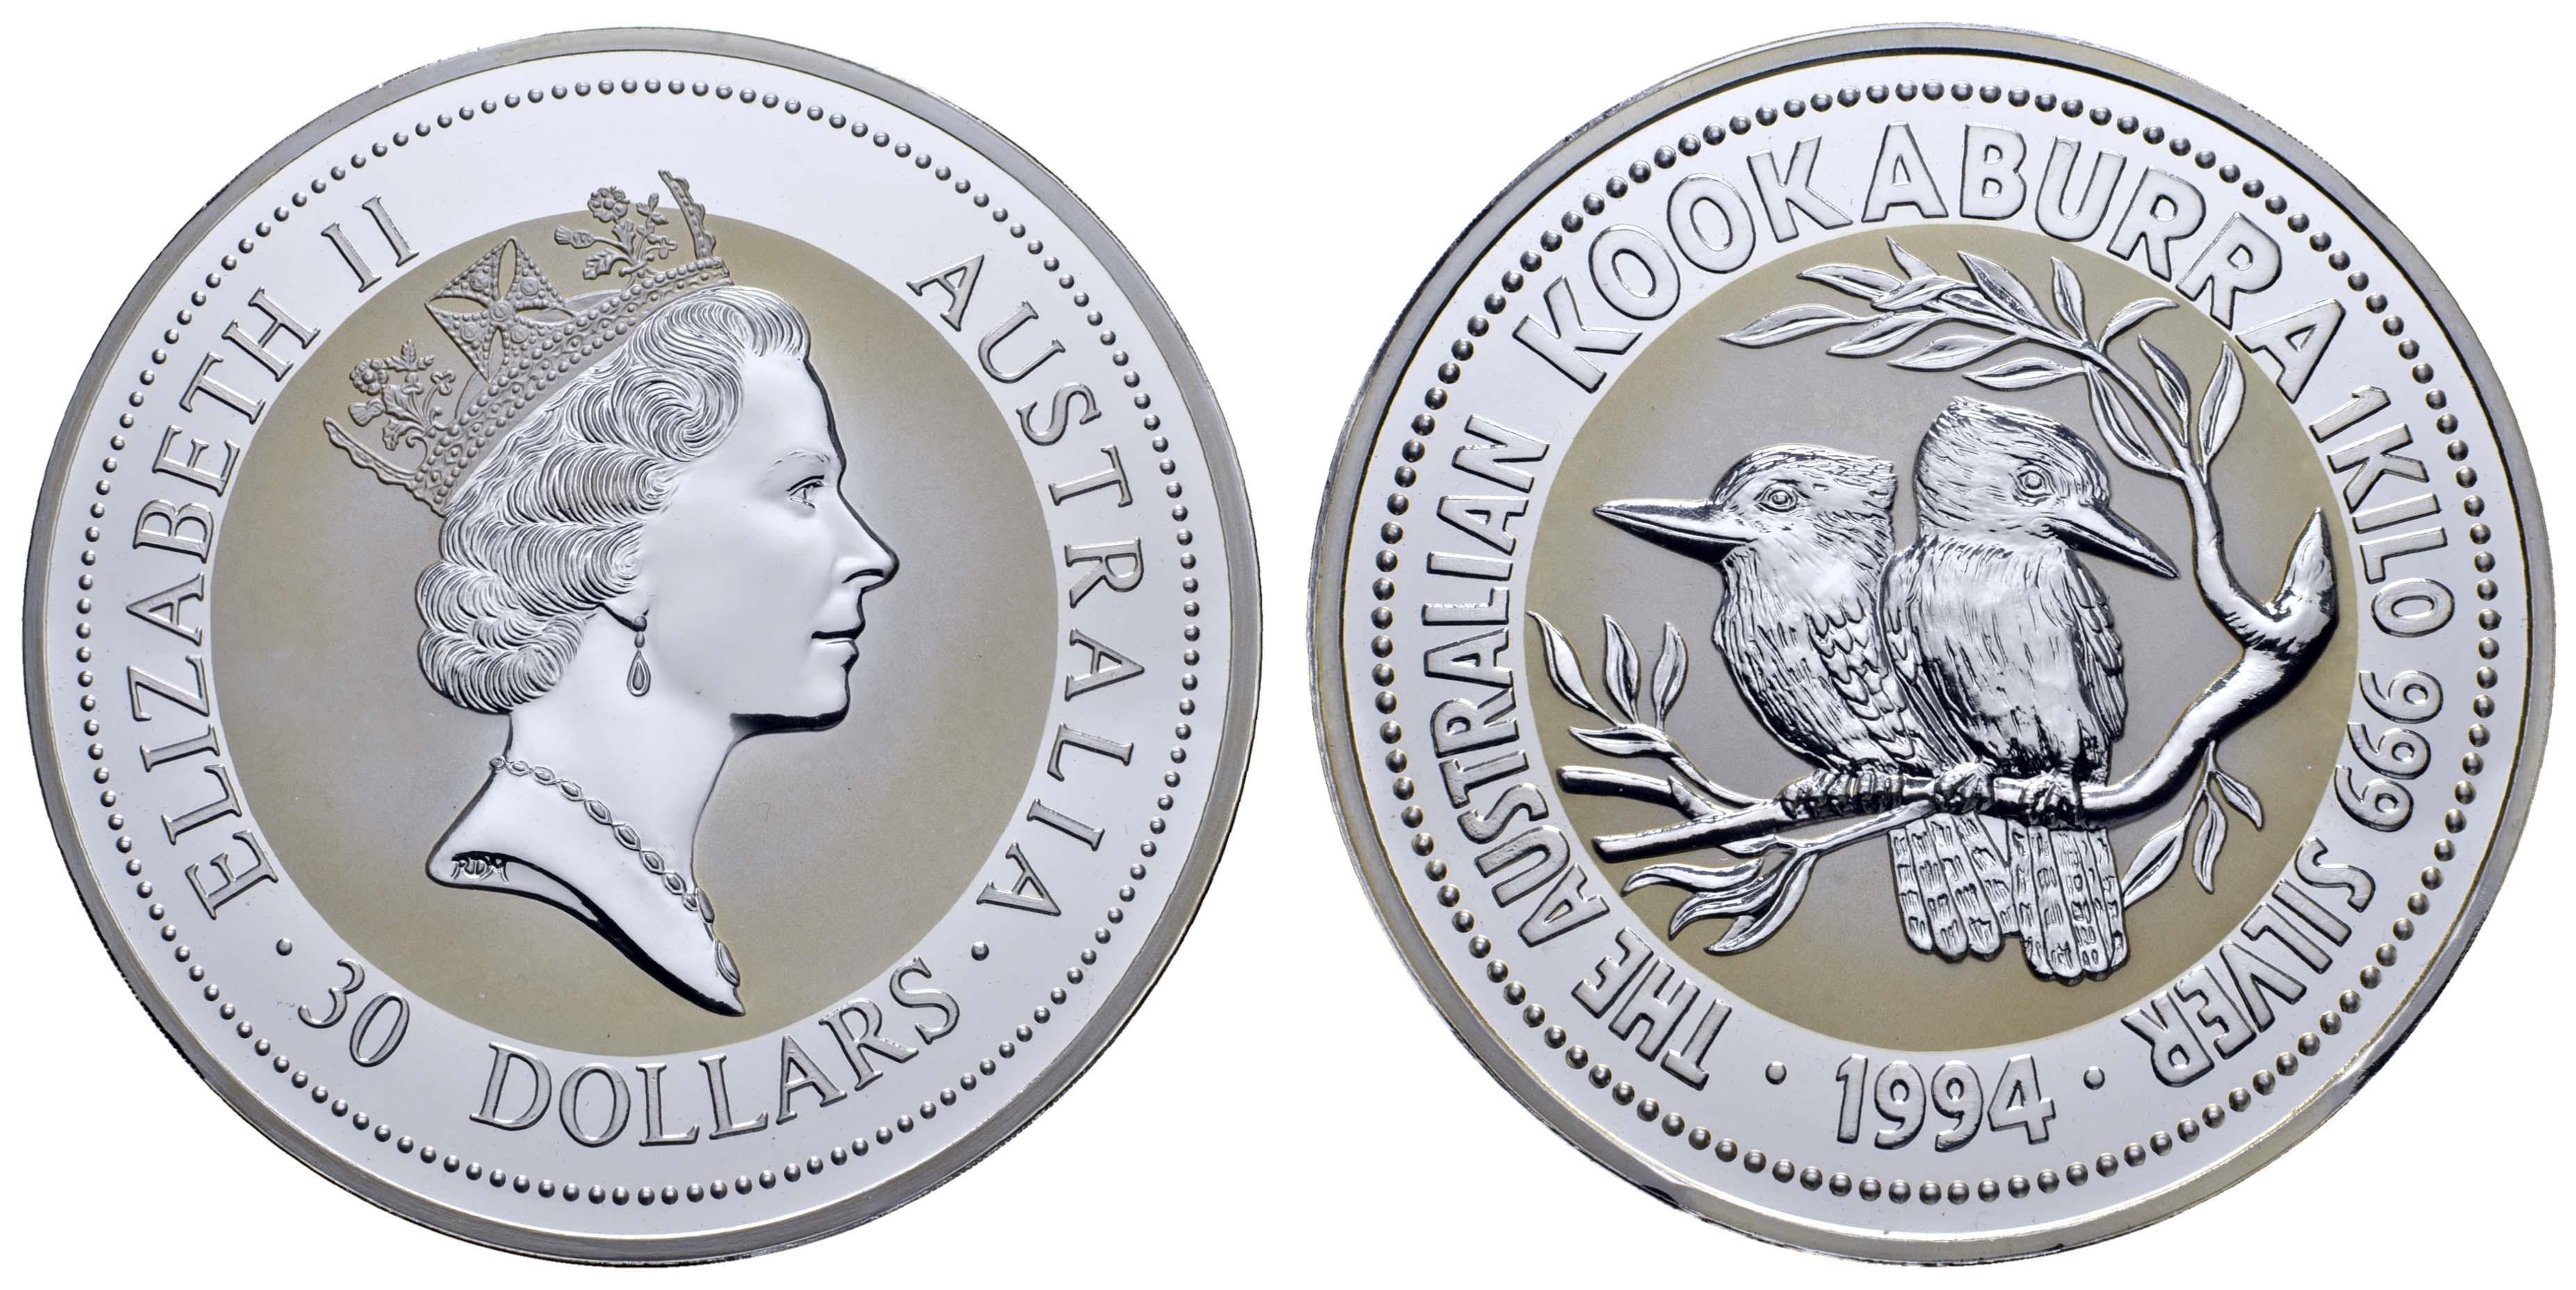 Lot 1869 - übersee australien -  Auktionshaus Ulrich Felzmann GmbH & Co. KG Coins single lots